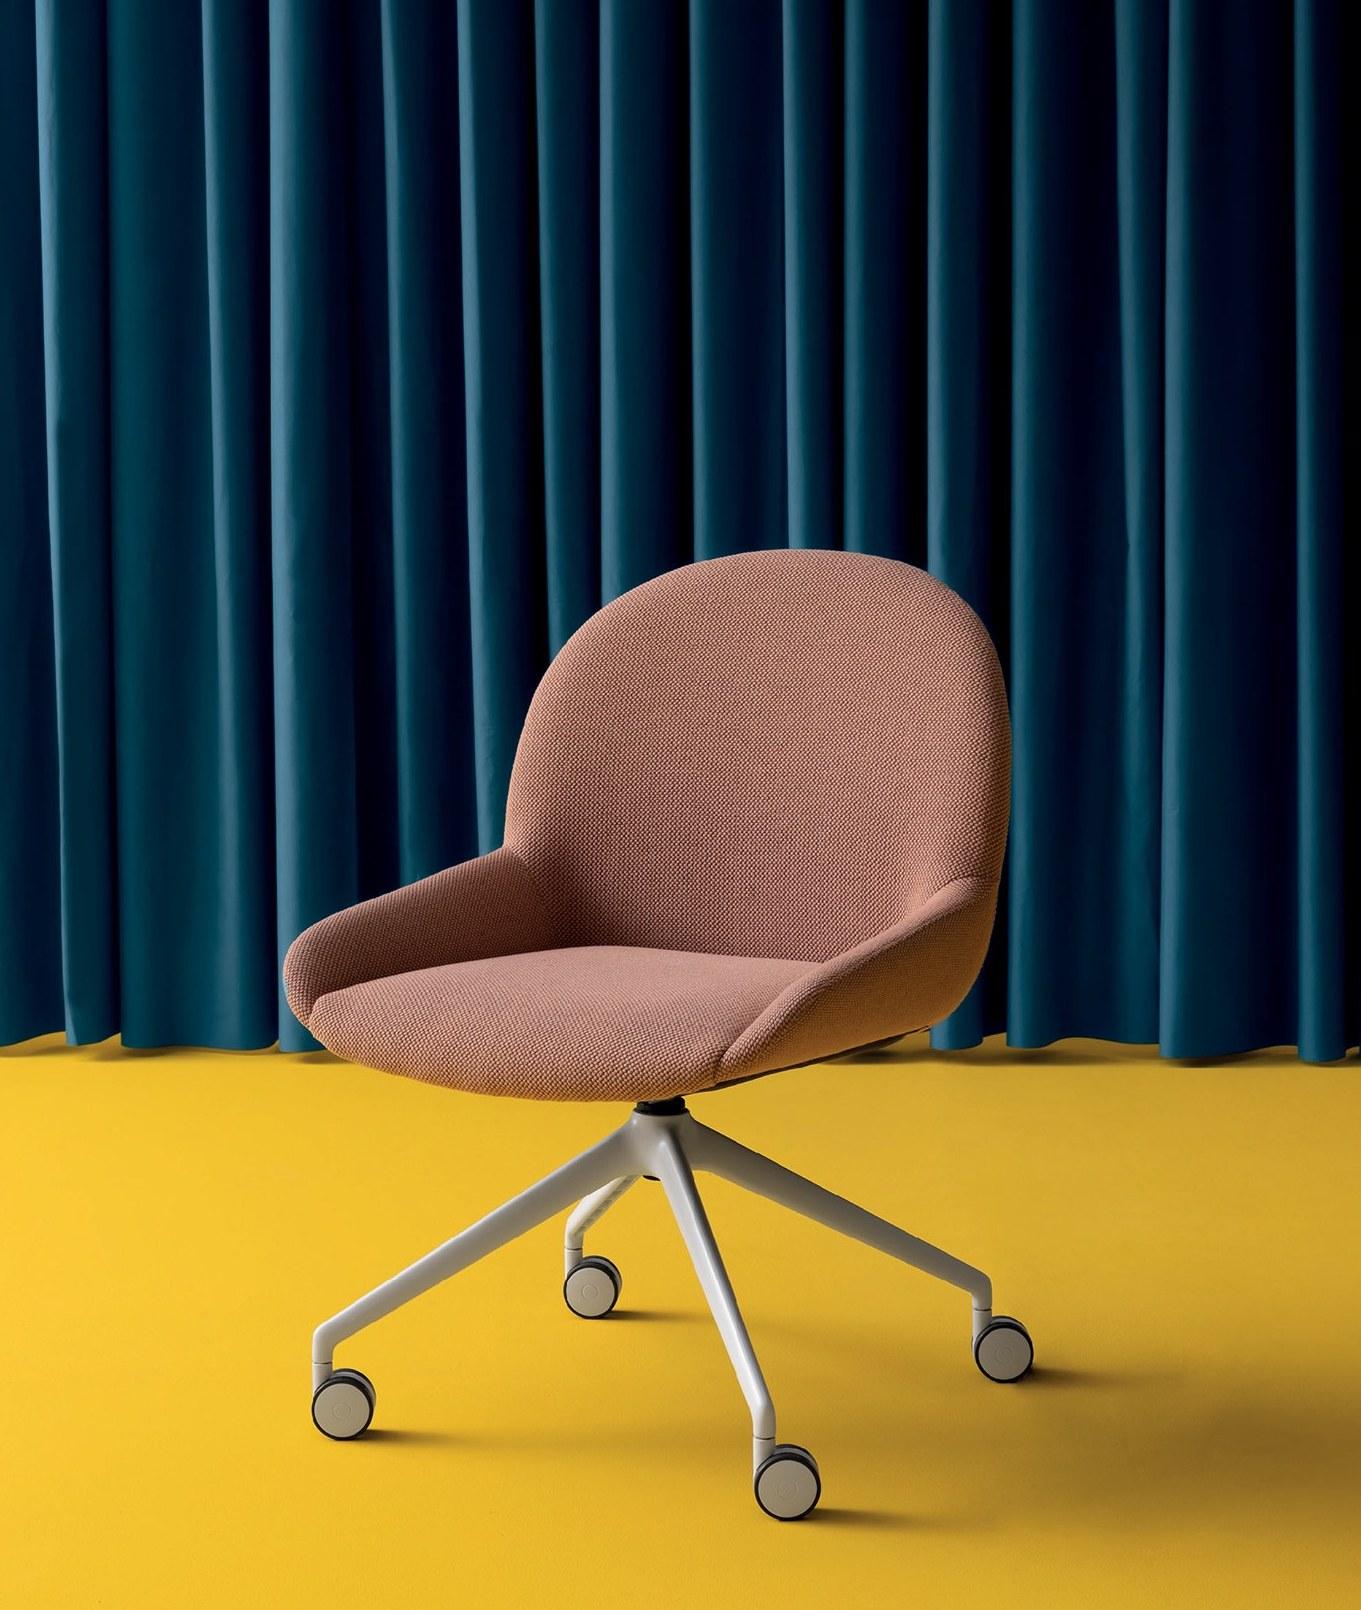 Blush Elba chair on four wheel star base designed by Debiasi Sandri for Crasseviig